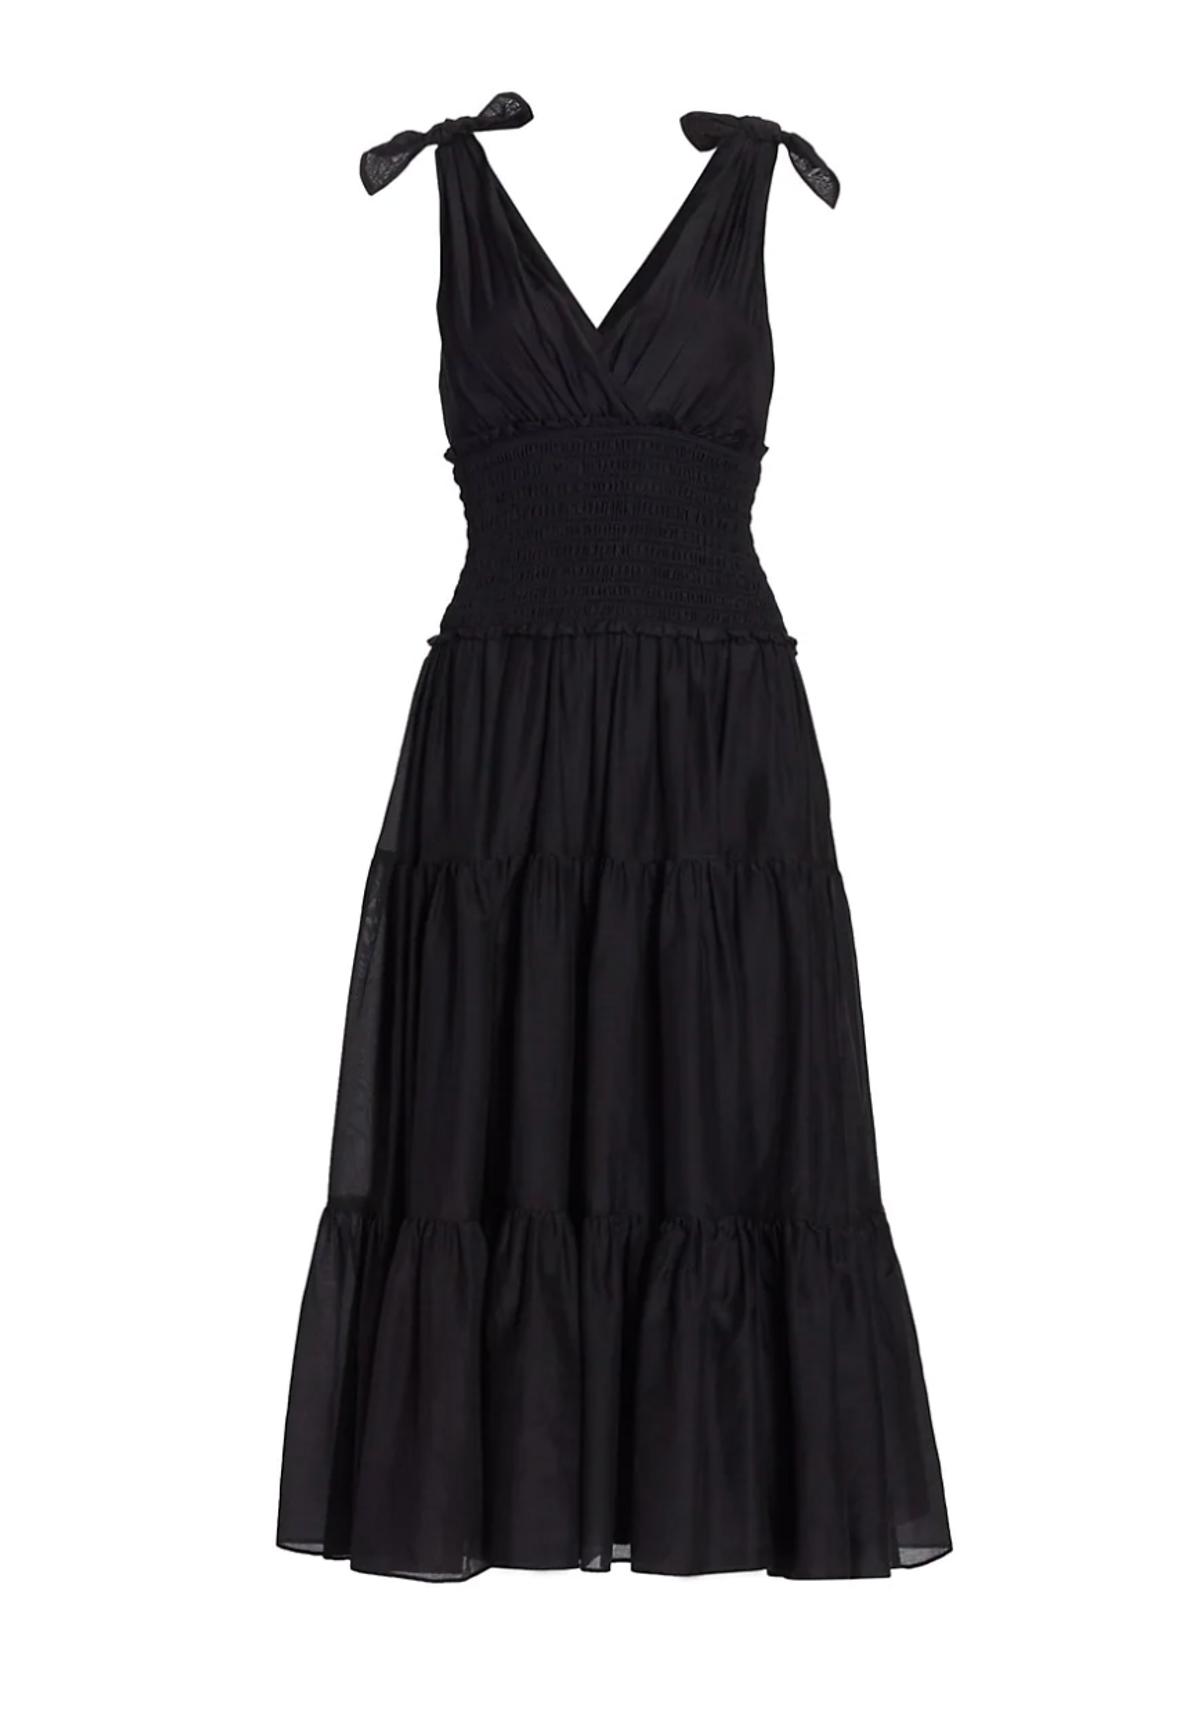 Tamar Tie-strap Smocked Dress